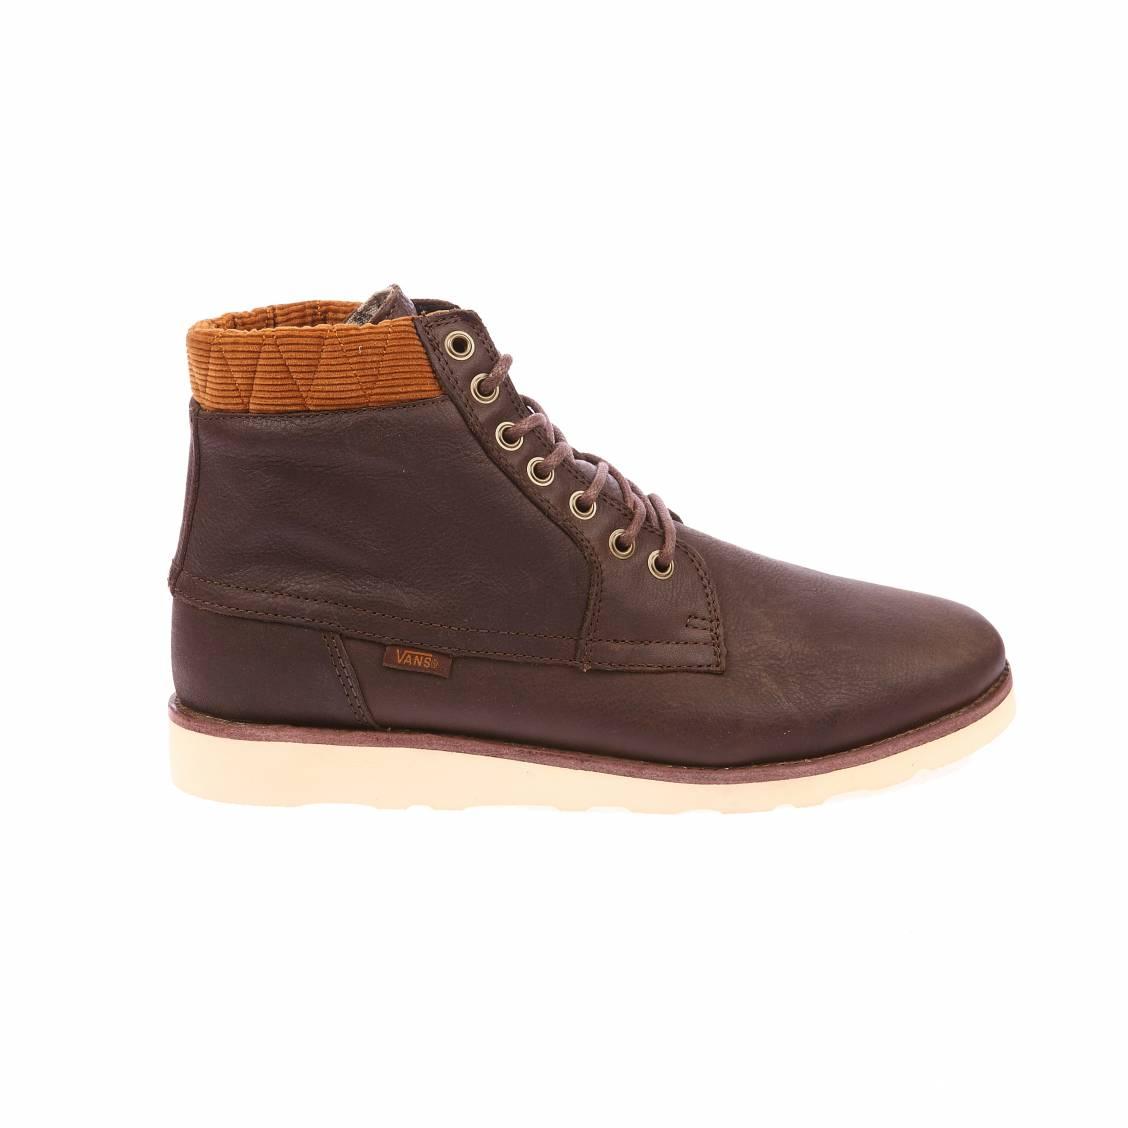 chaussures montantes breton boot se vans en cuir marron rue des hommes. Black Bedroom Furniture Sets. Home Design Ideas